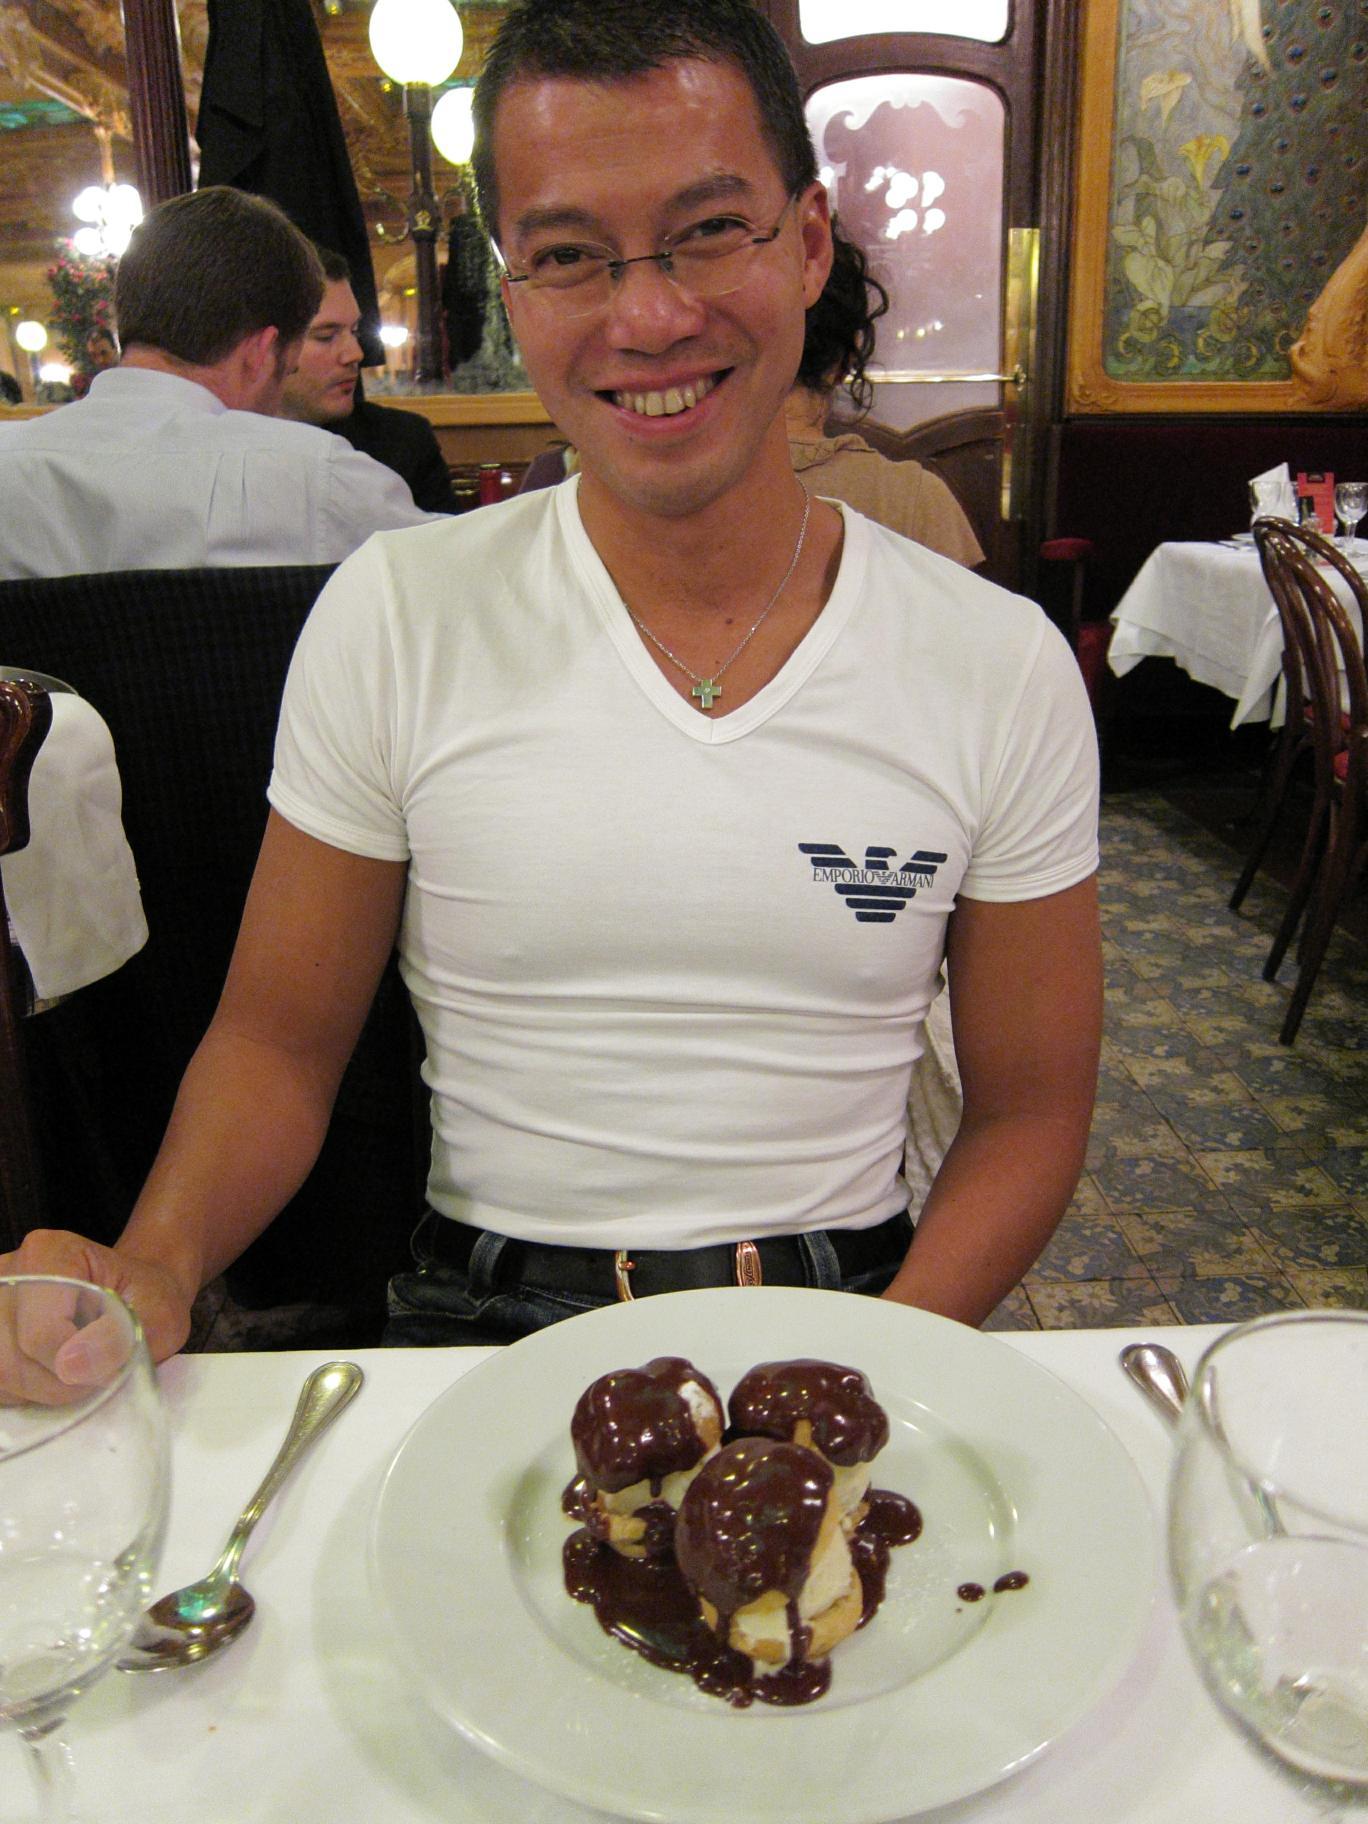 Jacques at Brasserie Julien